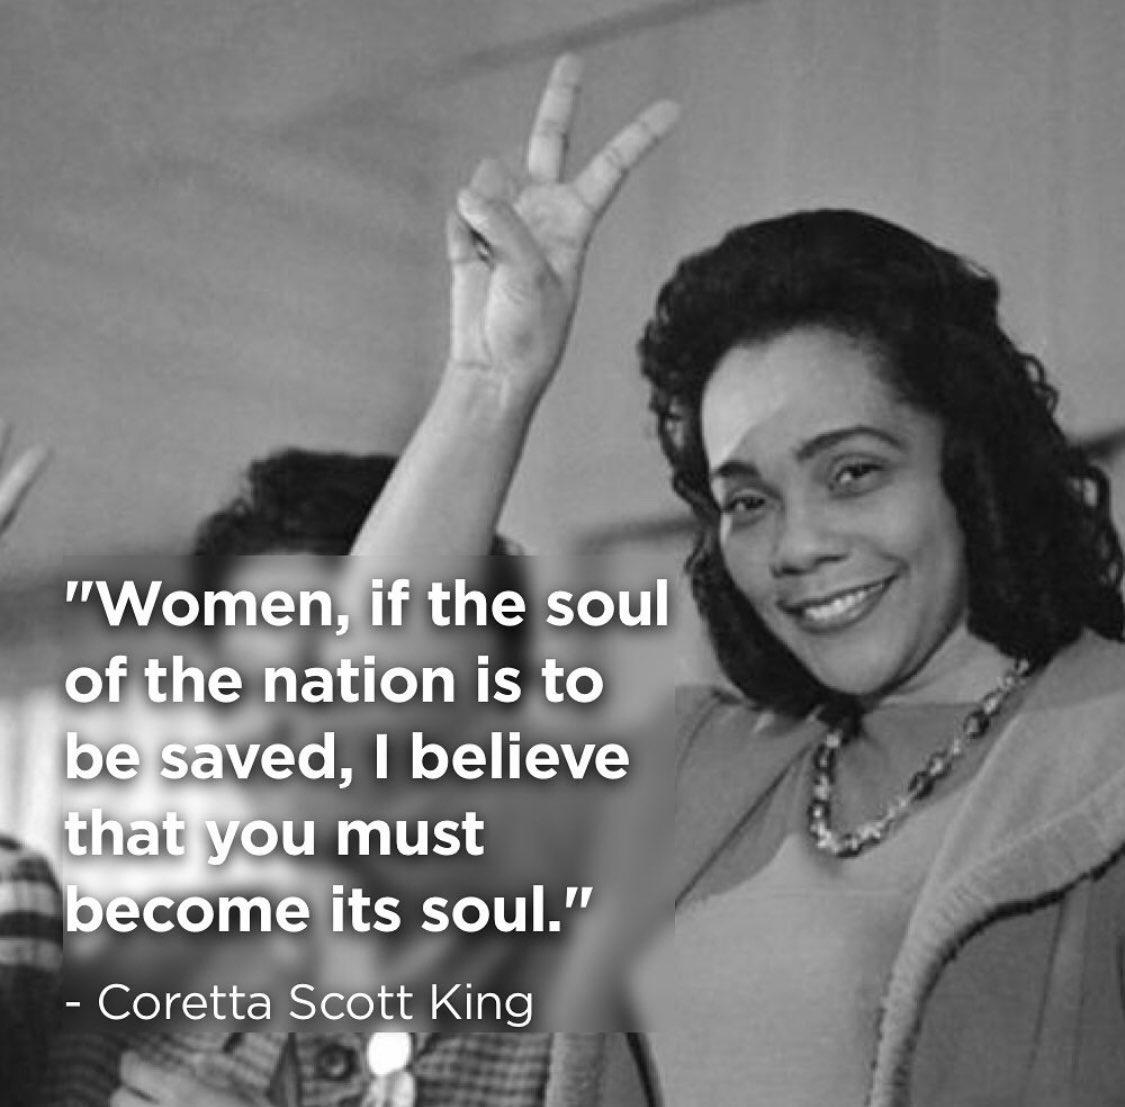 Coretta Scott King, a lifelong freedom fighter. #CorettaScottKing #MLKJr